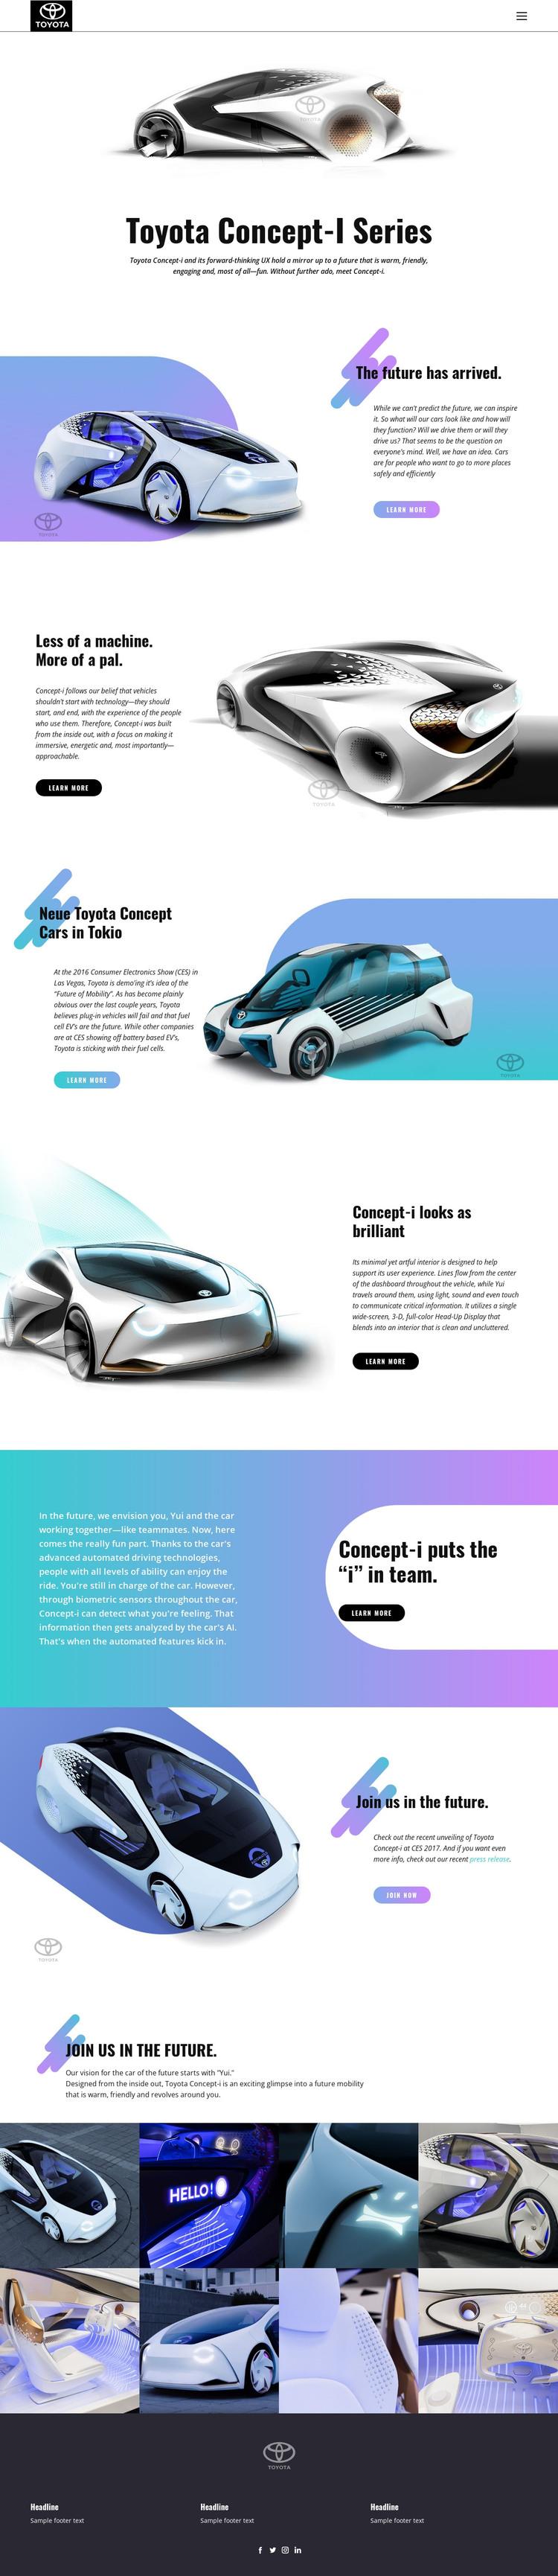 Advanced innovation cars Web Design